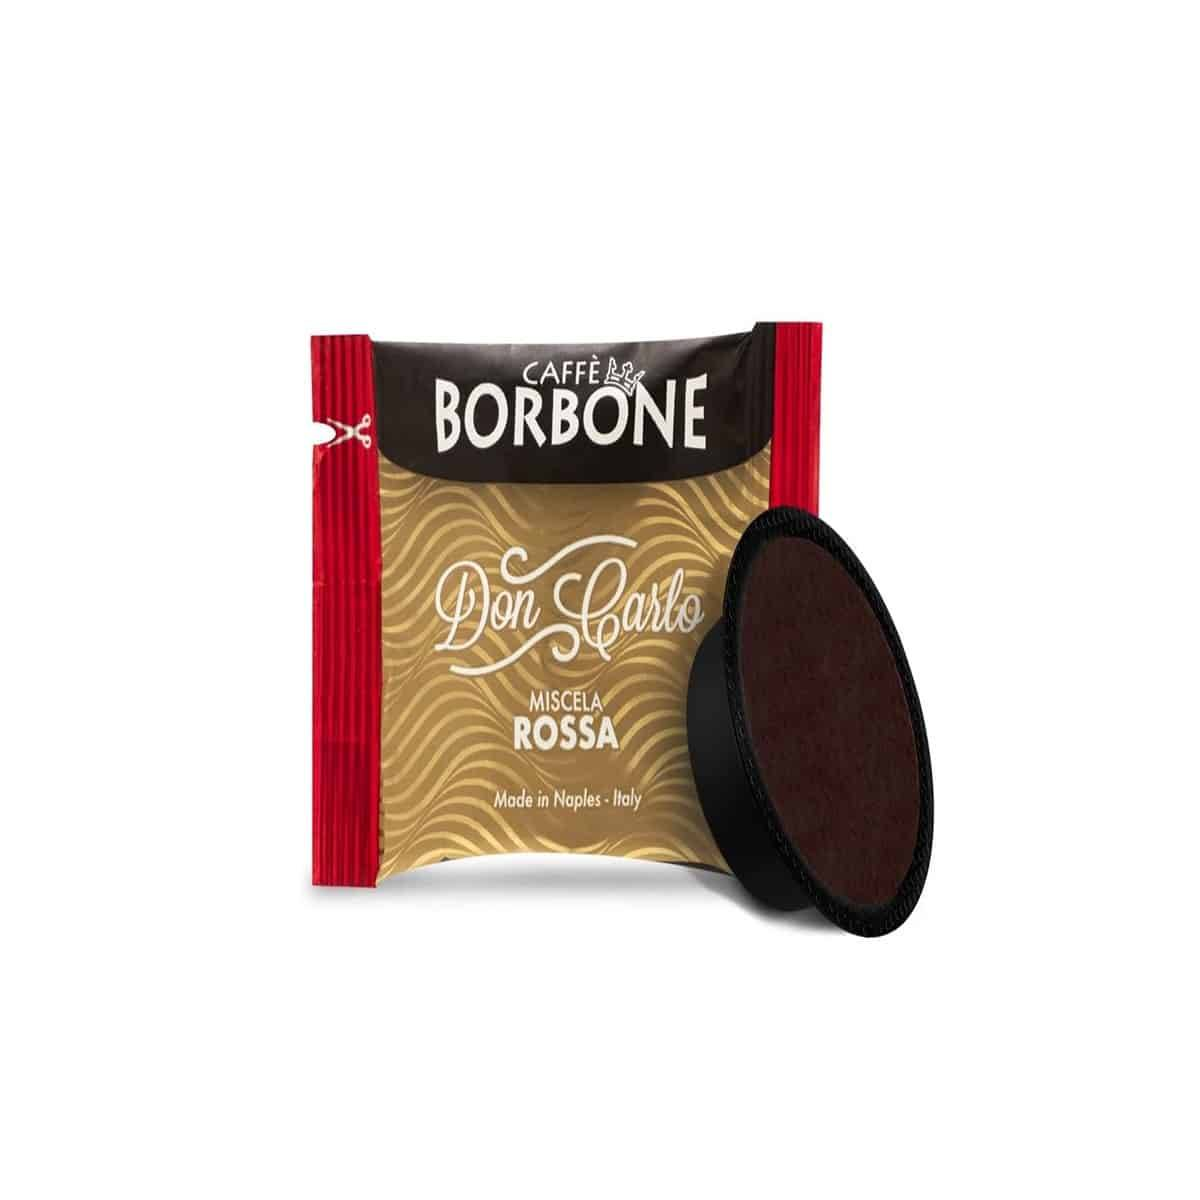 Rocard Caffè Borbone - Linea Don Carlo - Miscela Rossa 900 Capsule